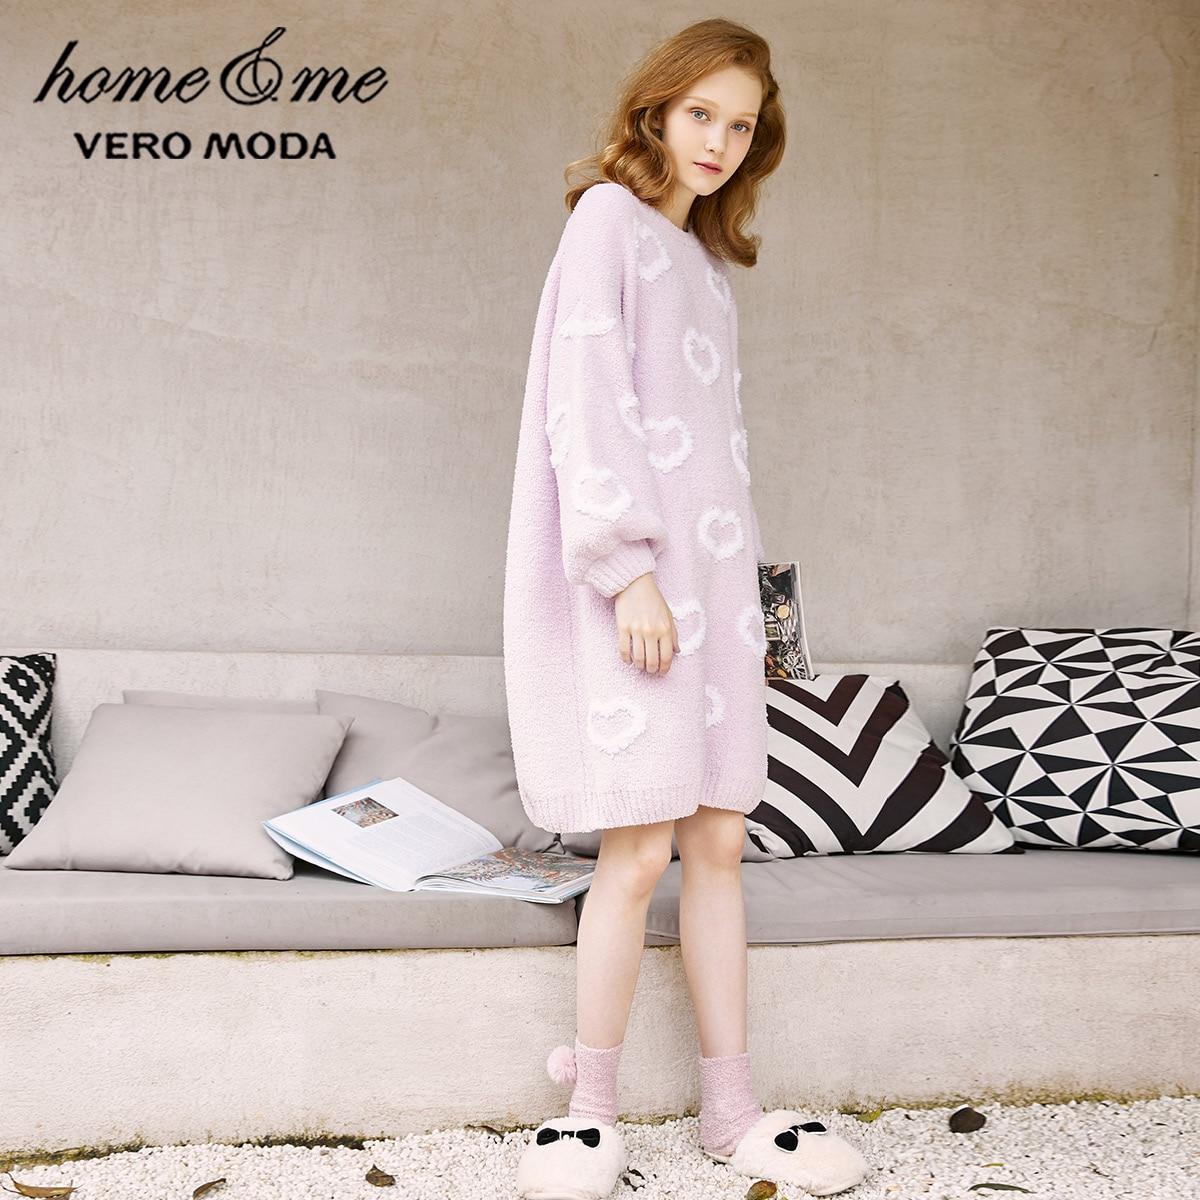 Vero Moda New Women's Heart-shaped Balloon Sleeves Sleepwear Dress   319446545